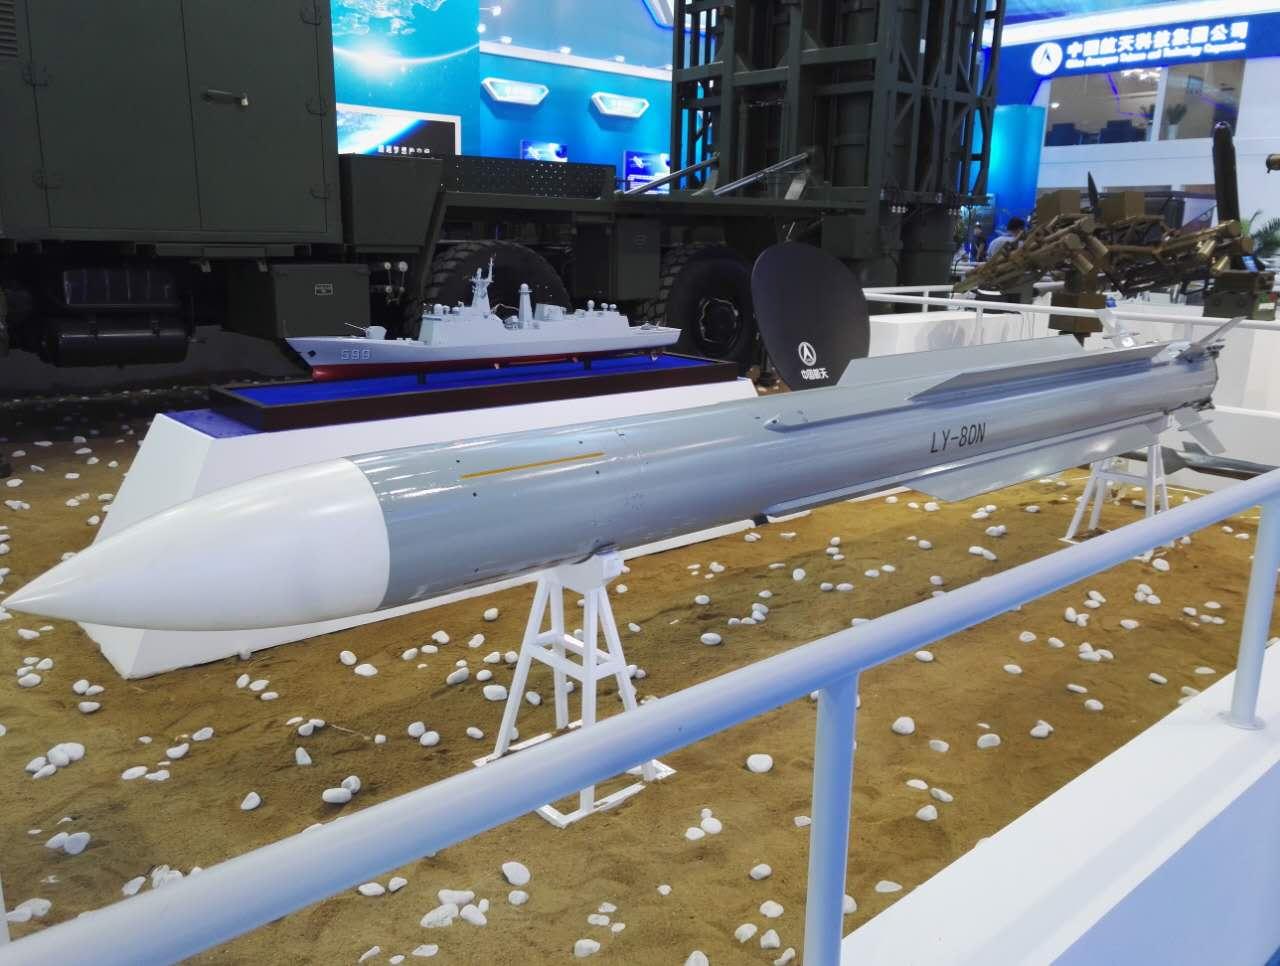 Le missile LY-80N